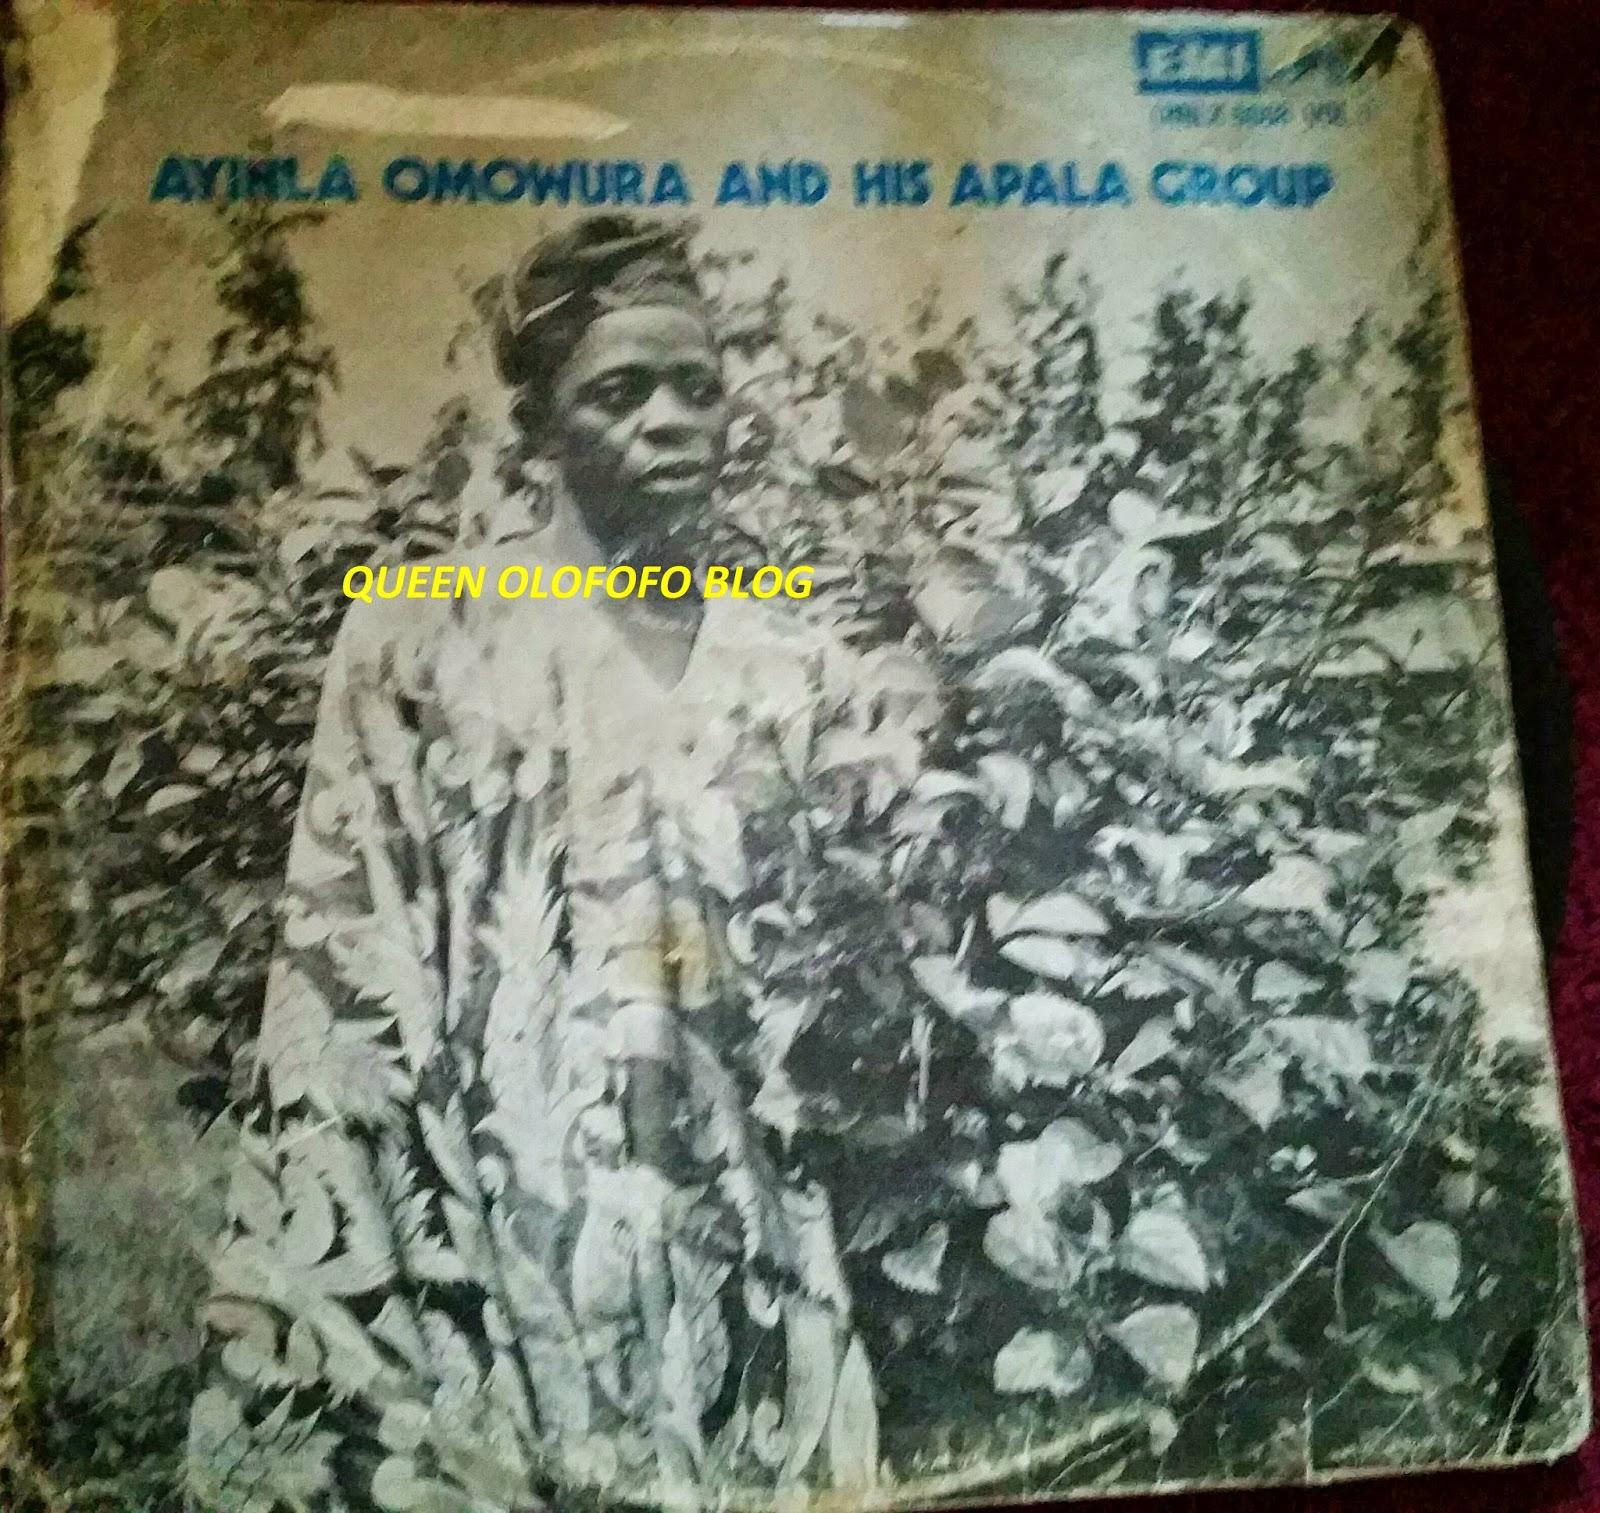 Apala king Ayinla omowura